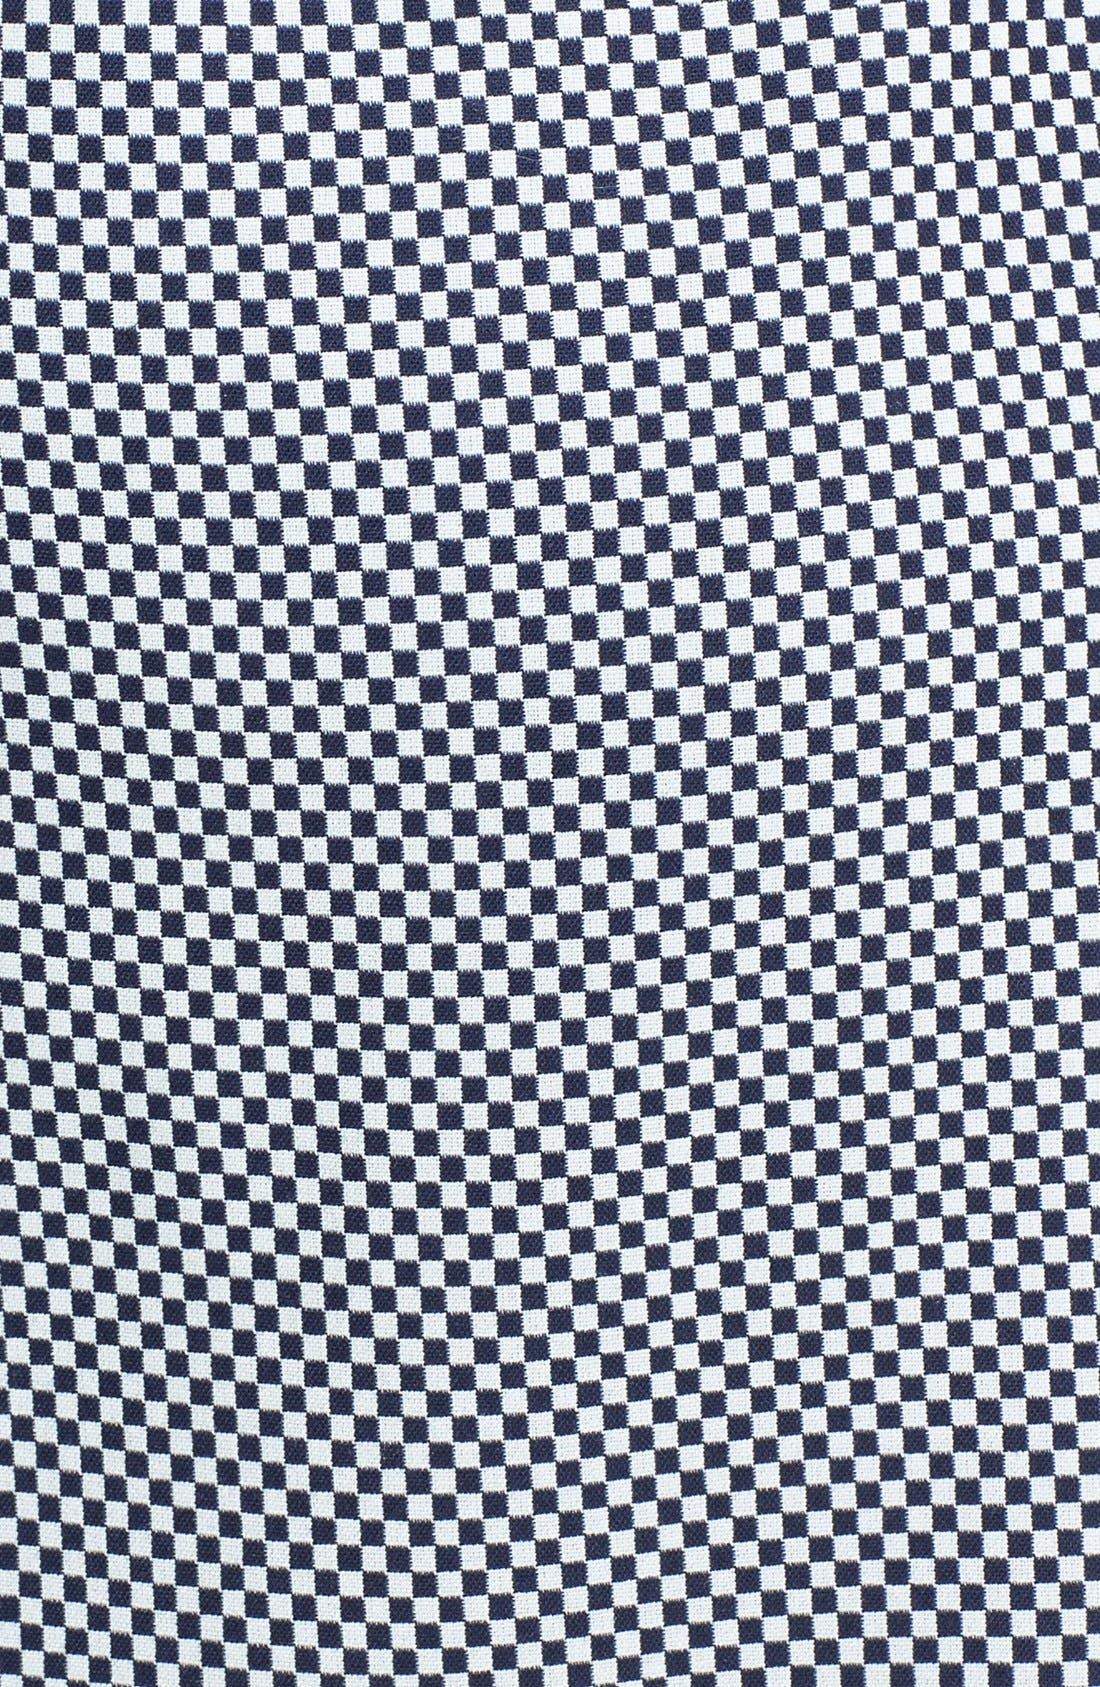 Alternate Image 3  - Anne Klein Check Print A-Line Skirt (Plus Size)